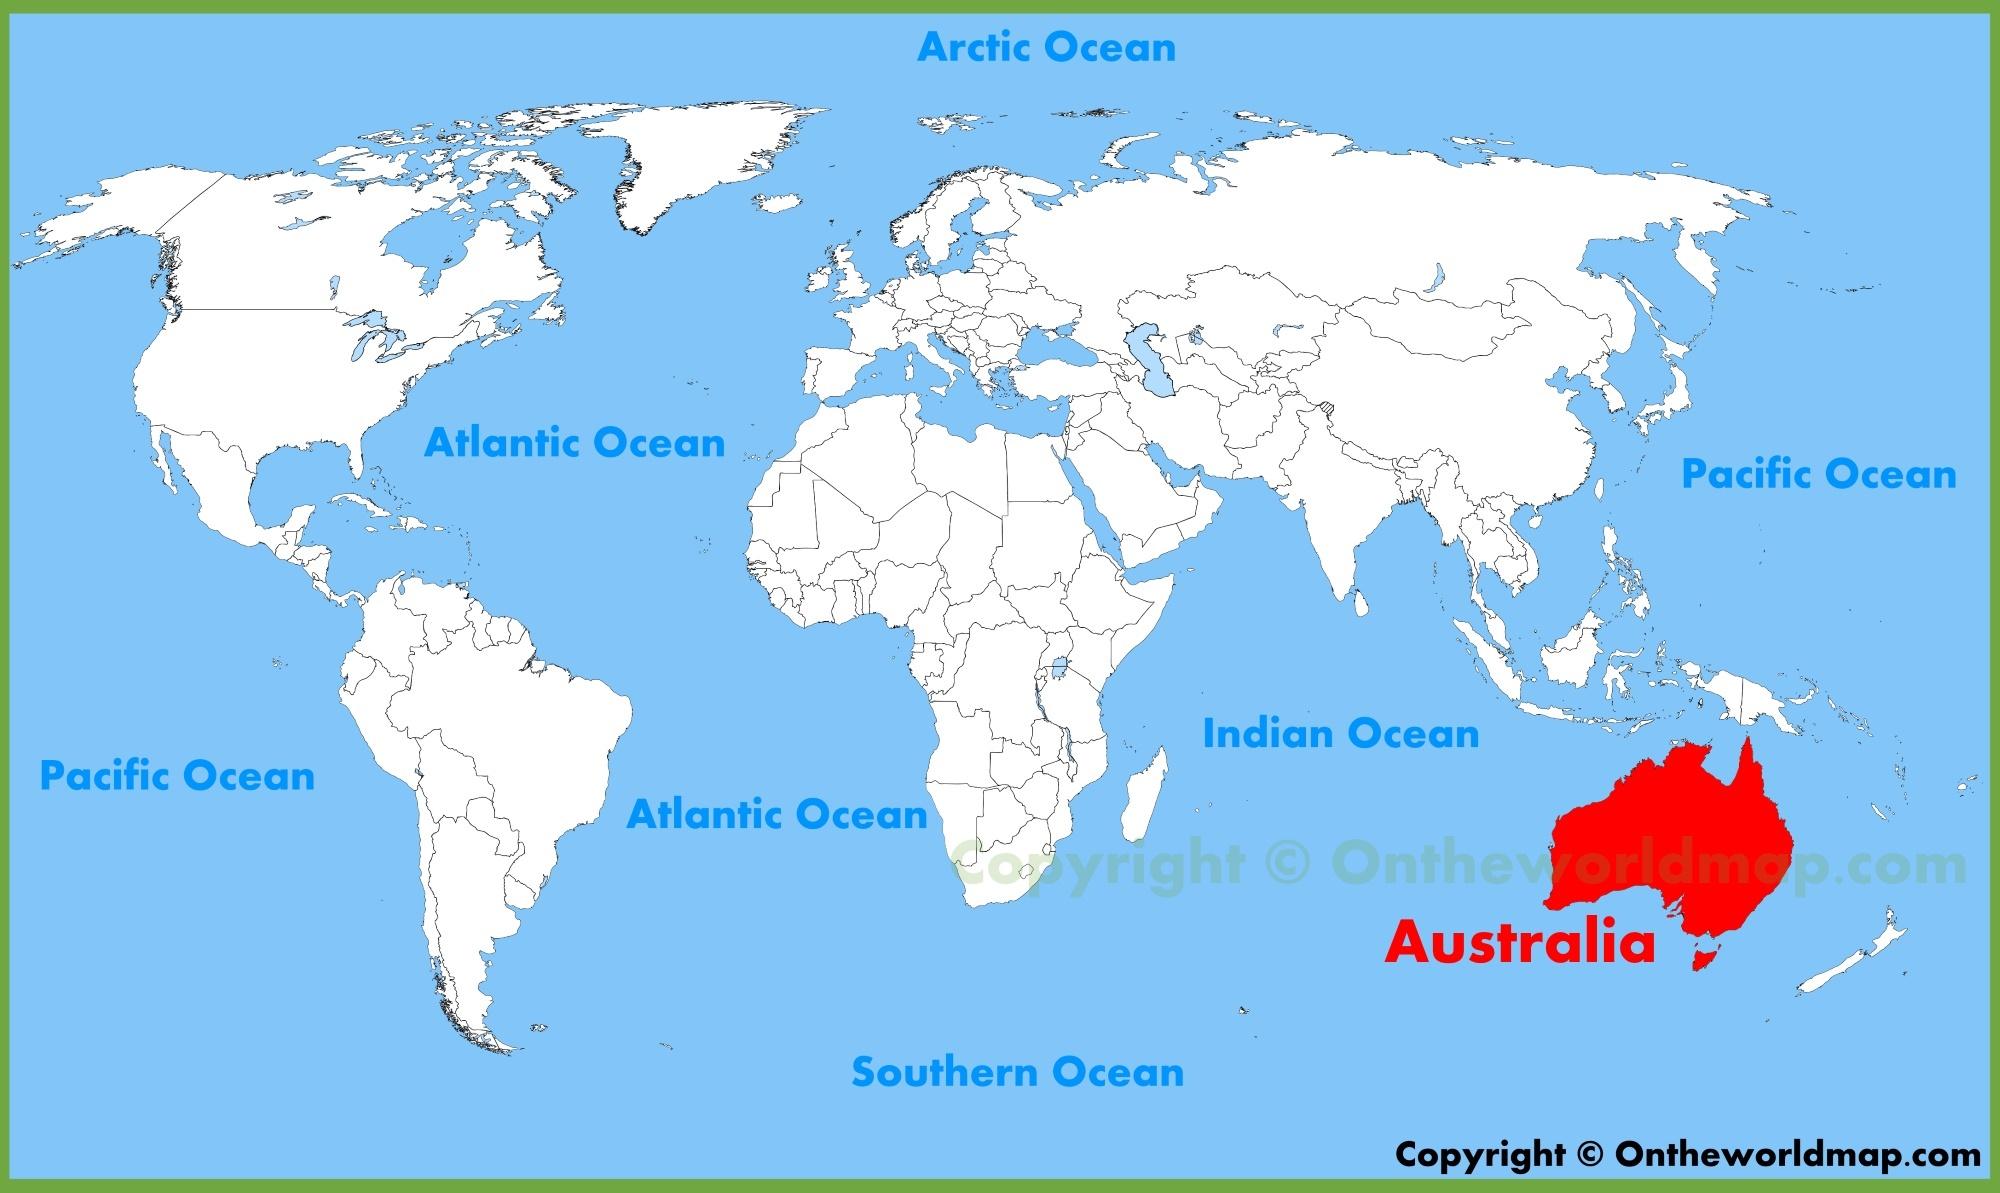 Australia location on the World Map